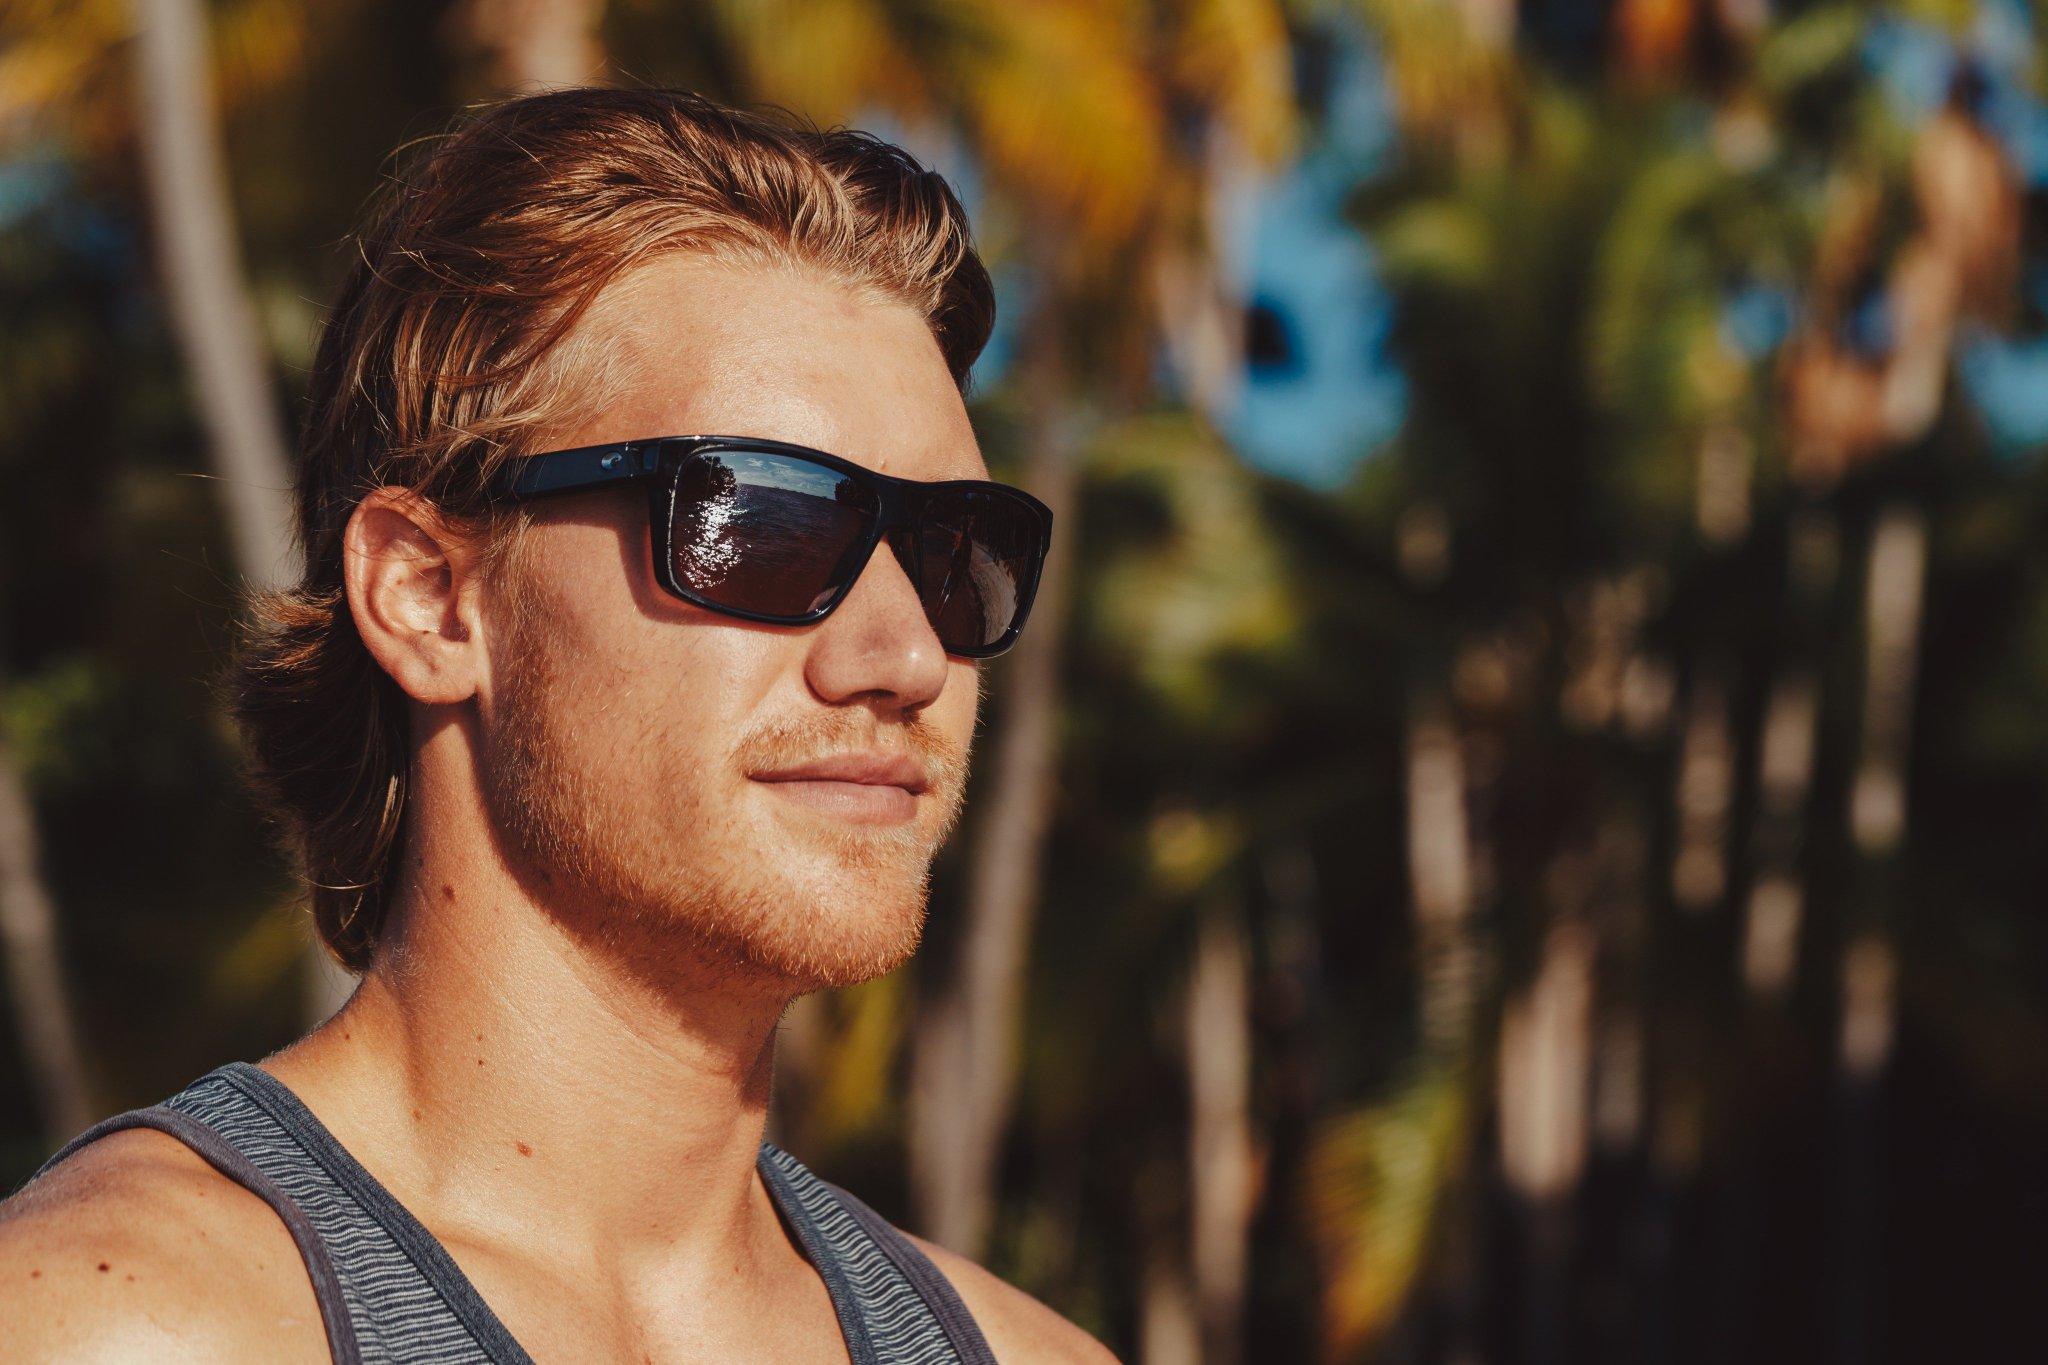 d5d132a1be Costa Sunglasses on Twitter